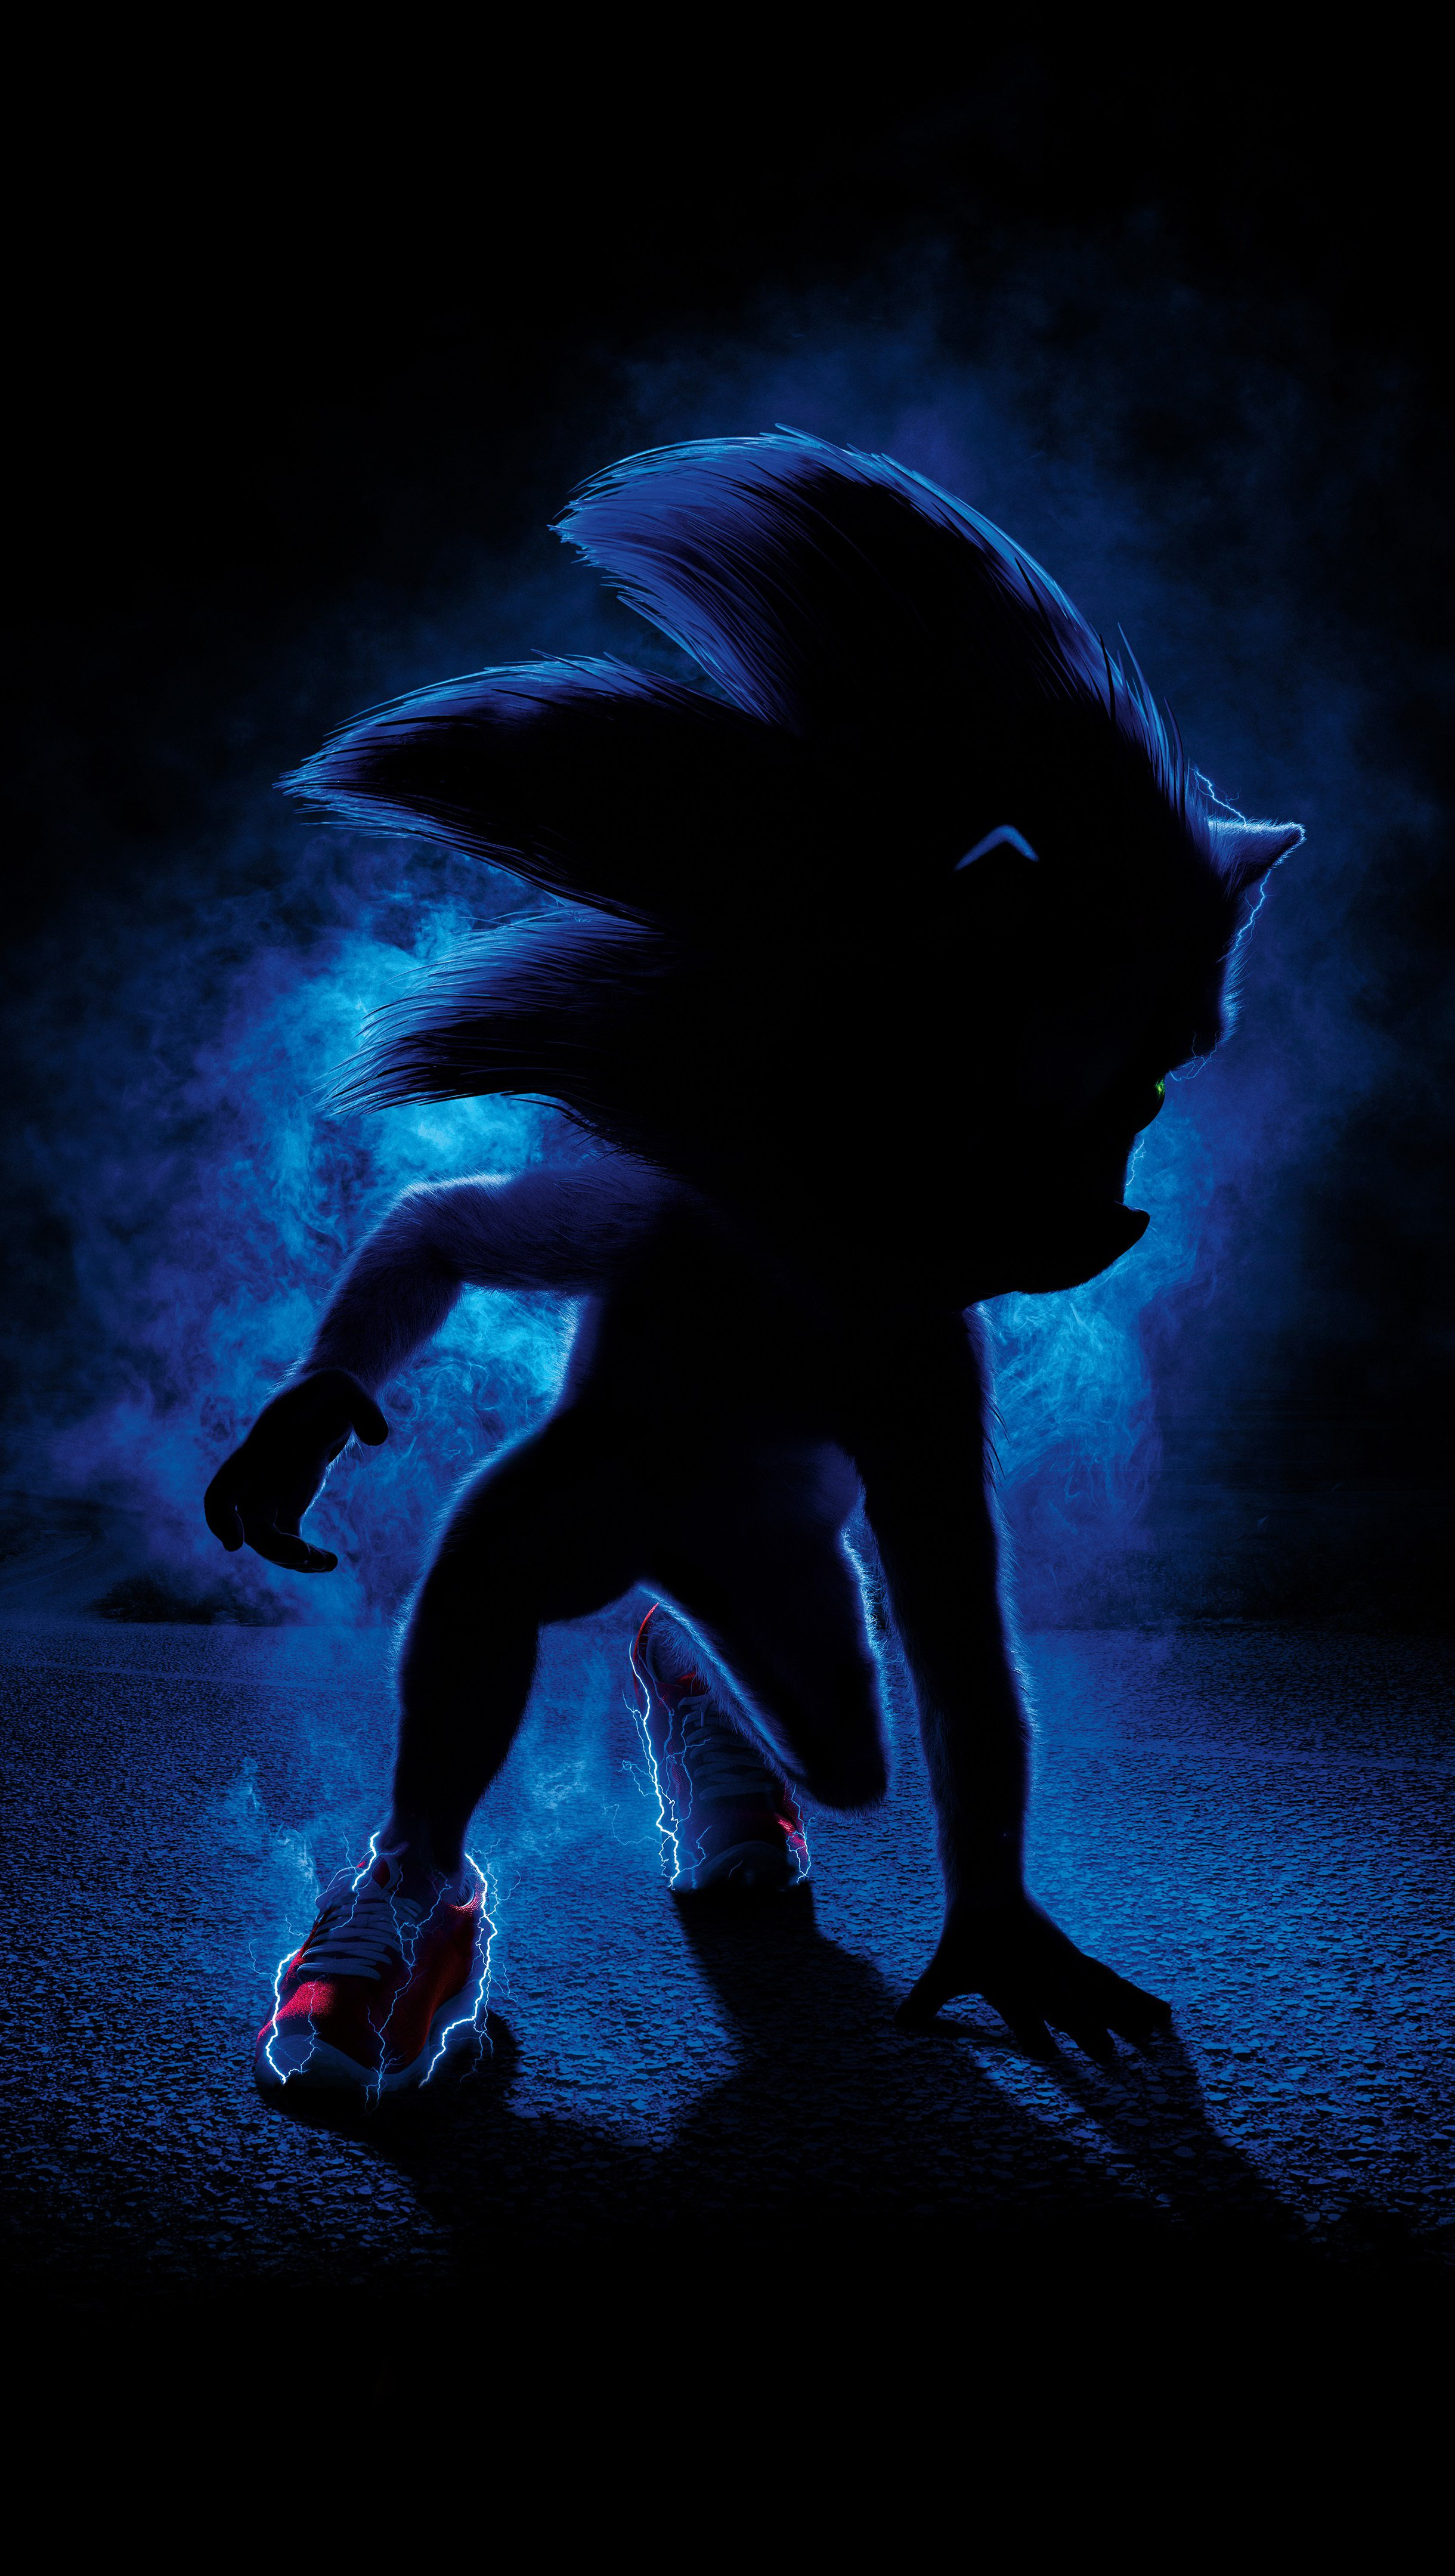 Fondos de pantalla Sonic the Hedgehog Película Vertical